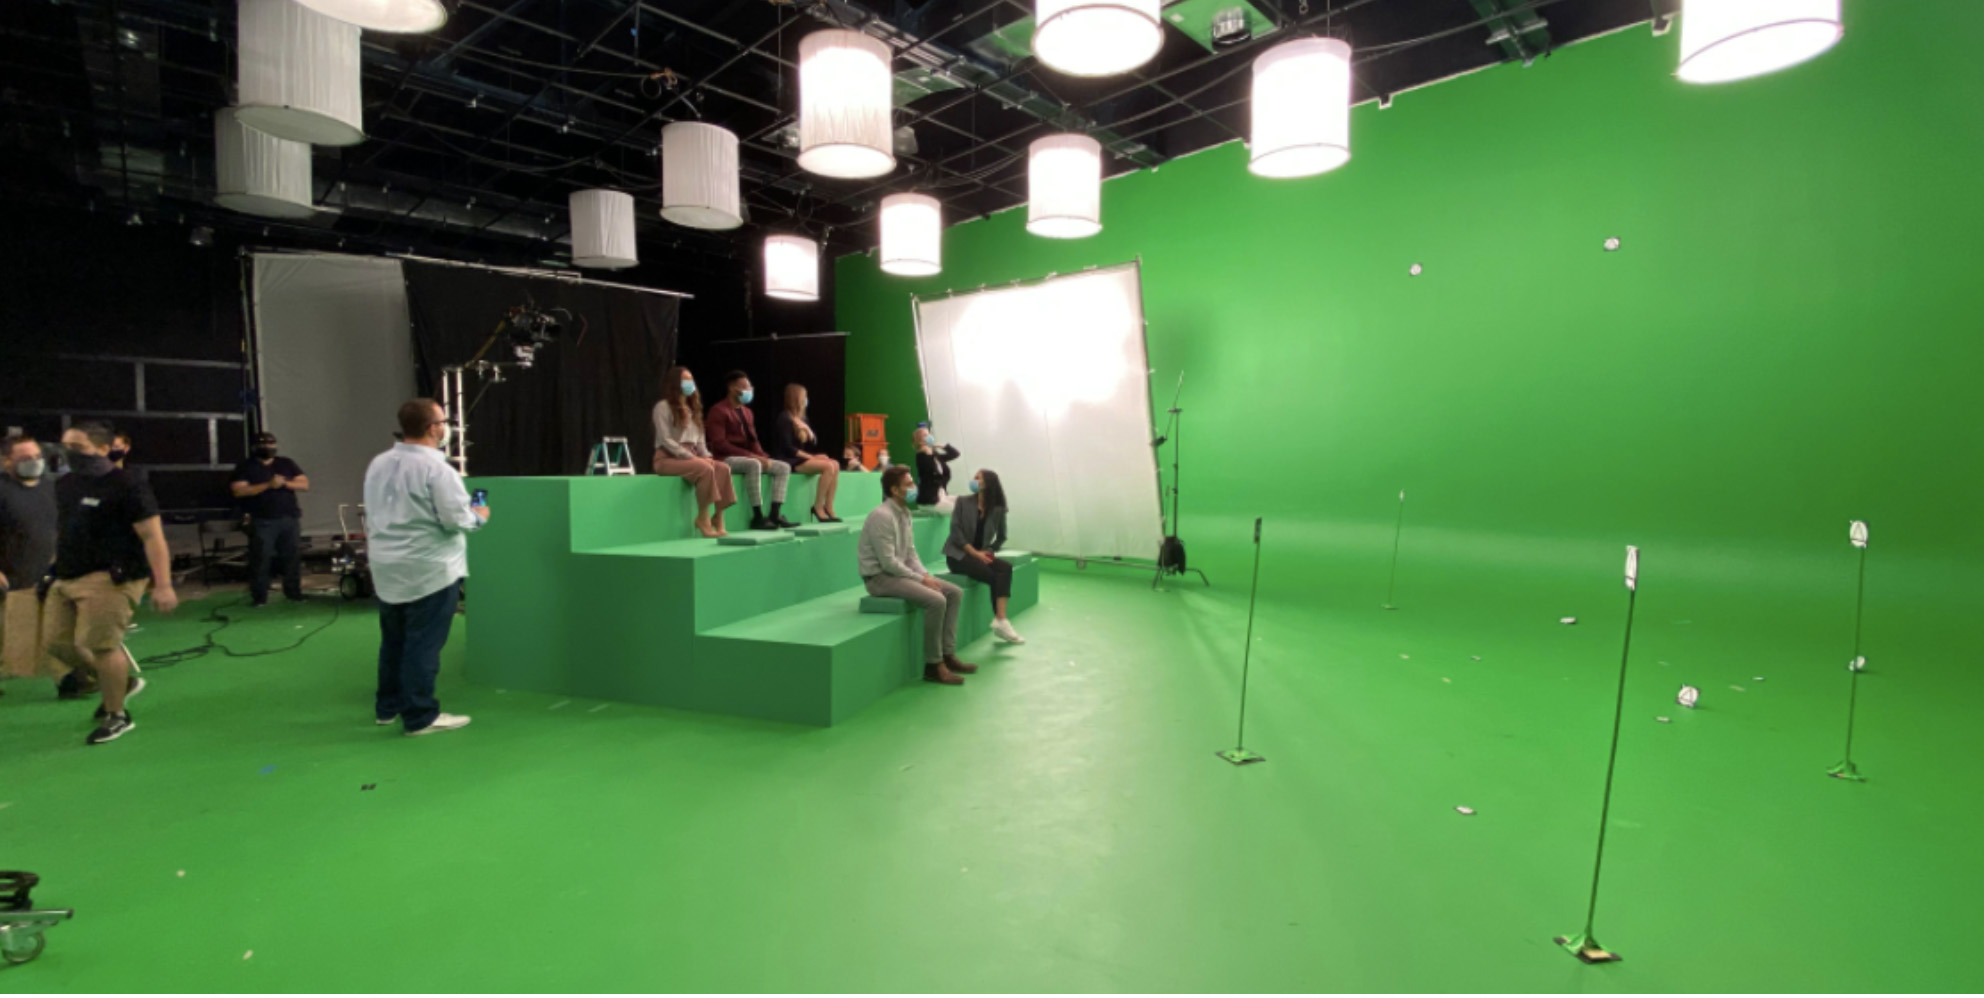 Brooklyn Mega Green Screen SFX Stage